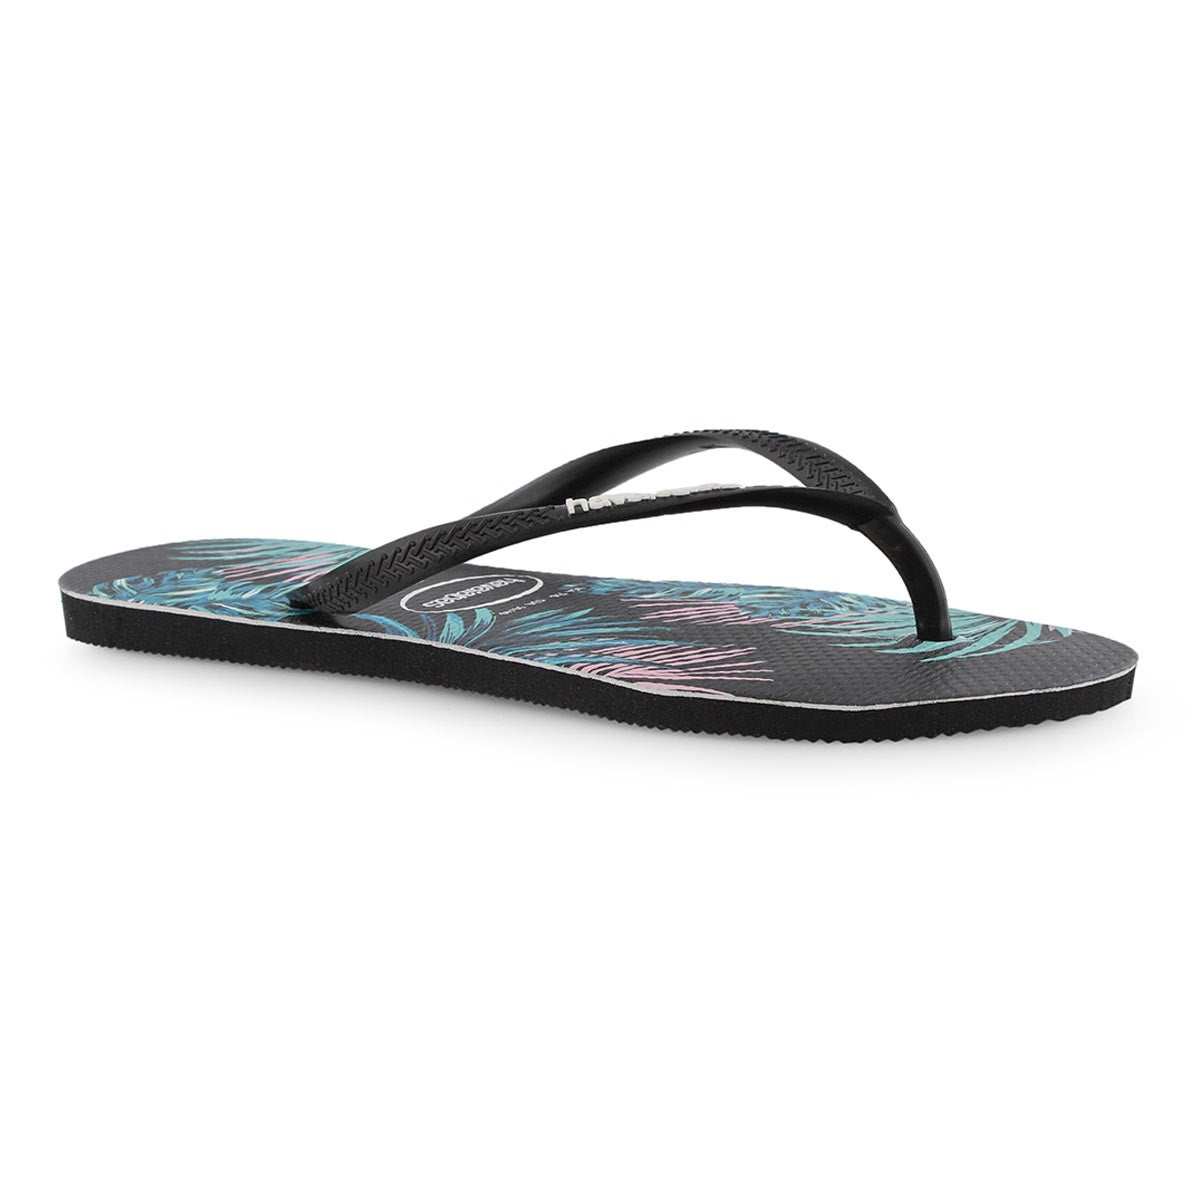 Women's Slim Tropical Floral Flip Flop - Black/Mlt